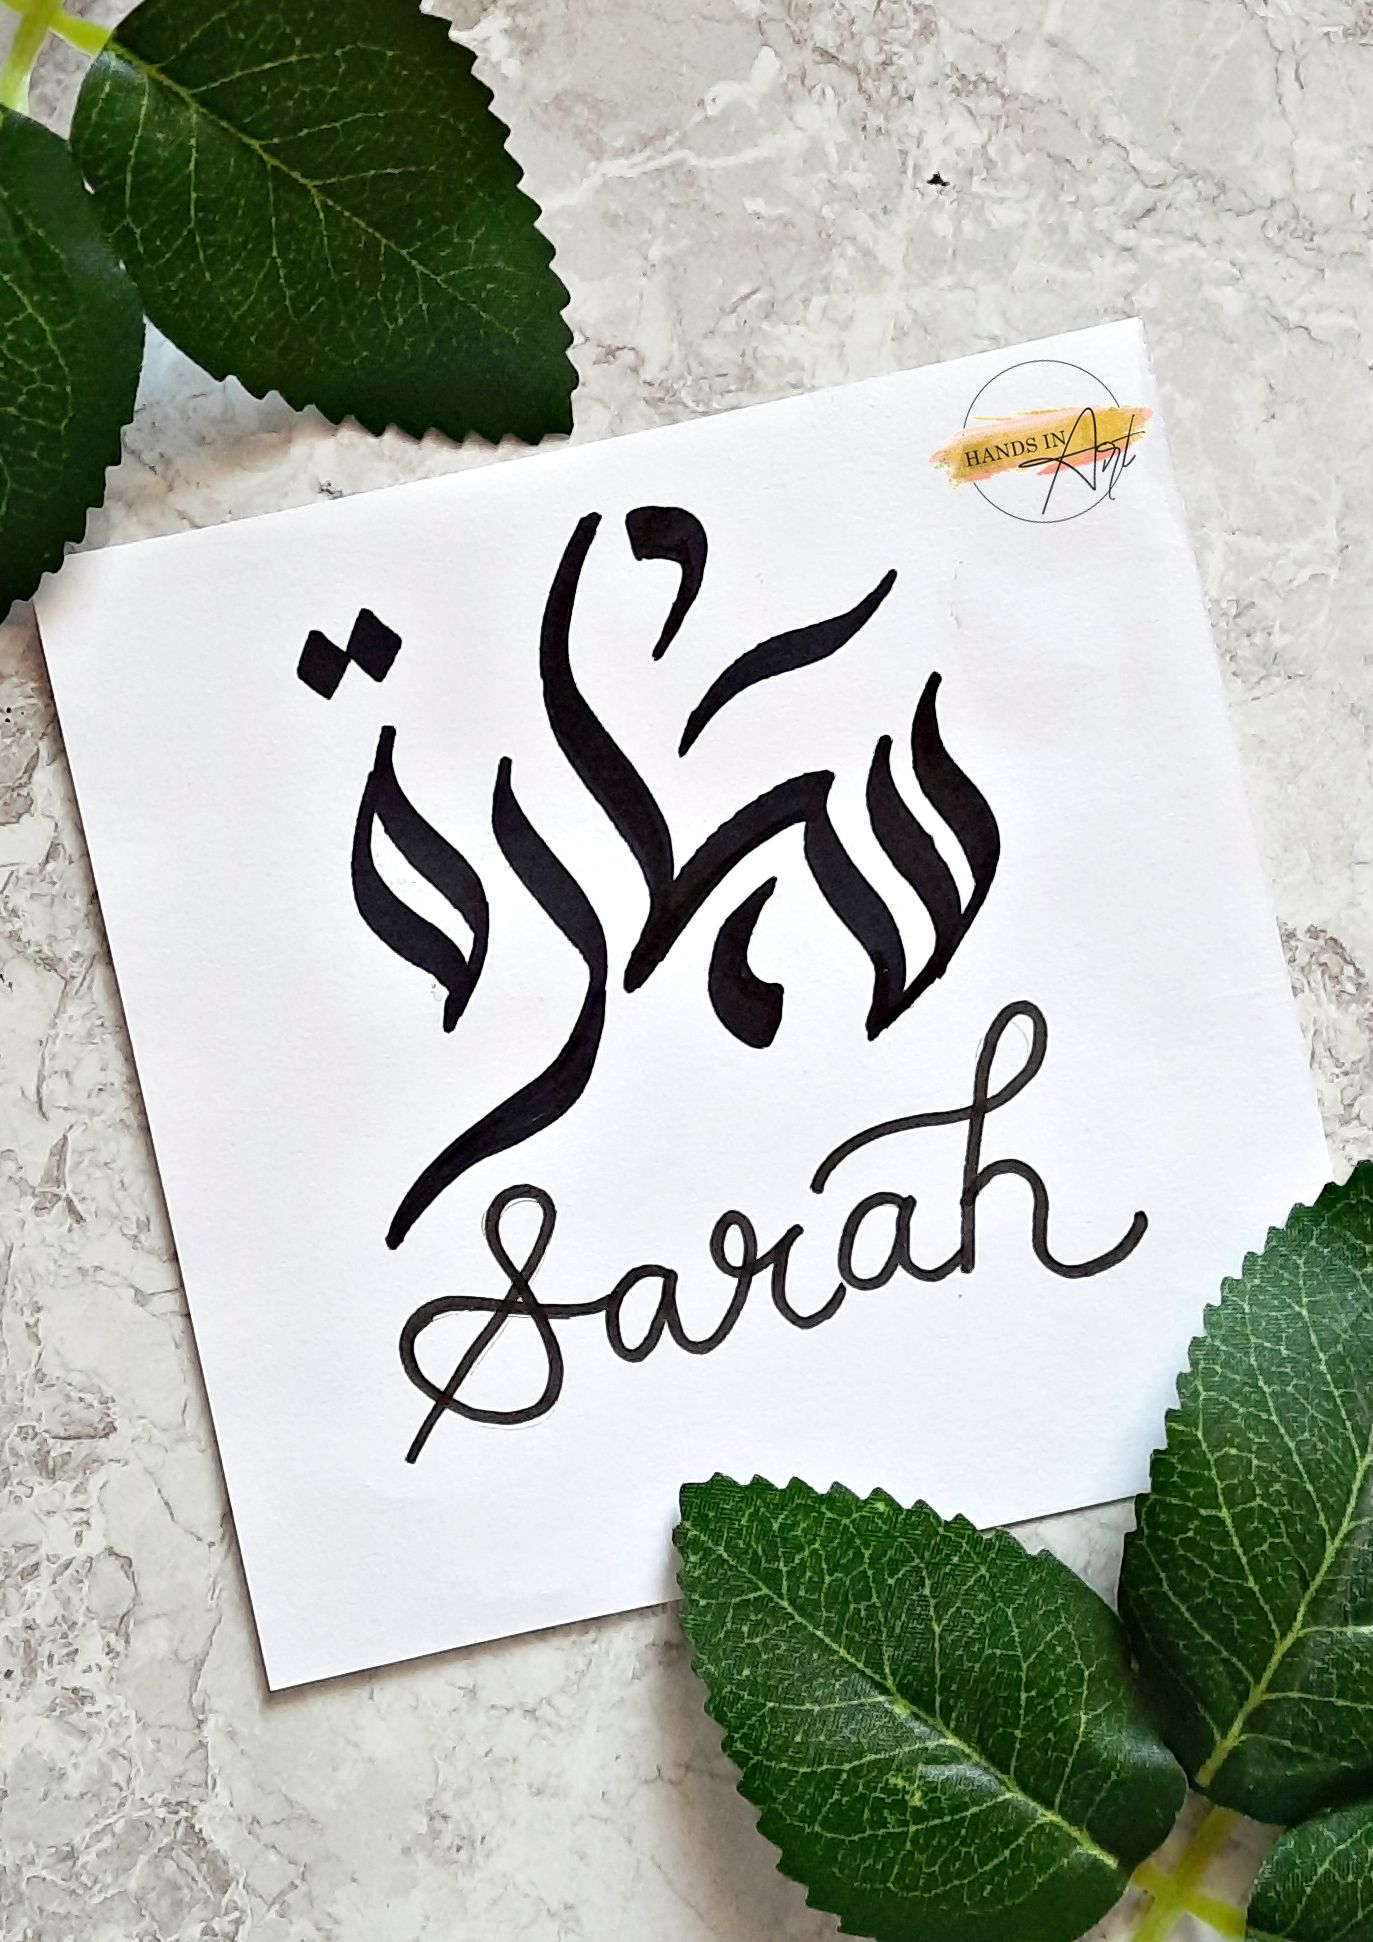 Sarah Name In Arabic Calligraphy Arabic Calligraphy Calligraphy Name Calligraphy Art